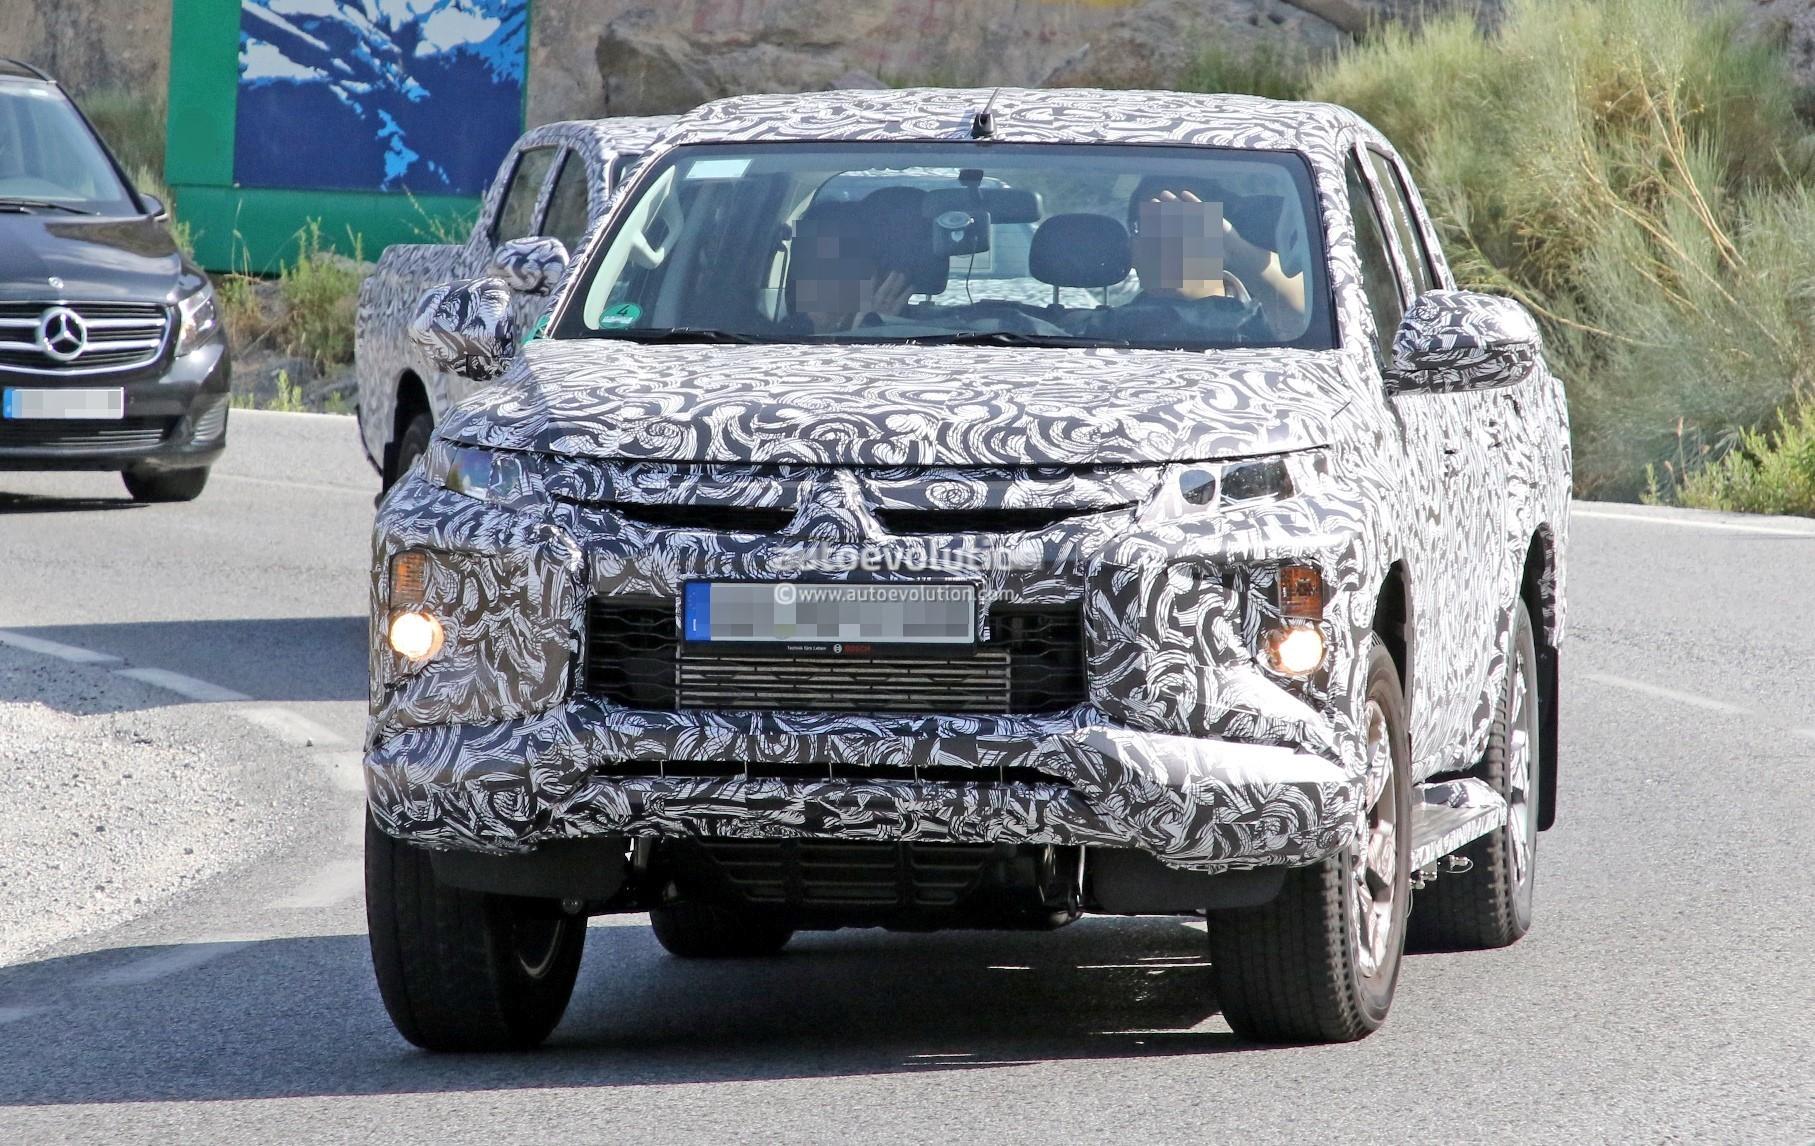 Mitsubishi Will Debut New L200 Pickup Truck In November 2018